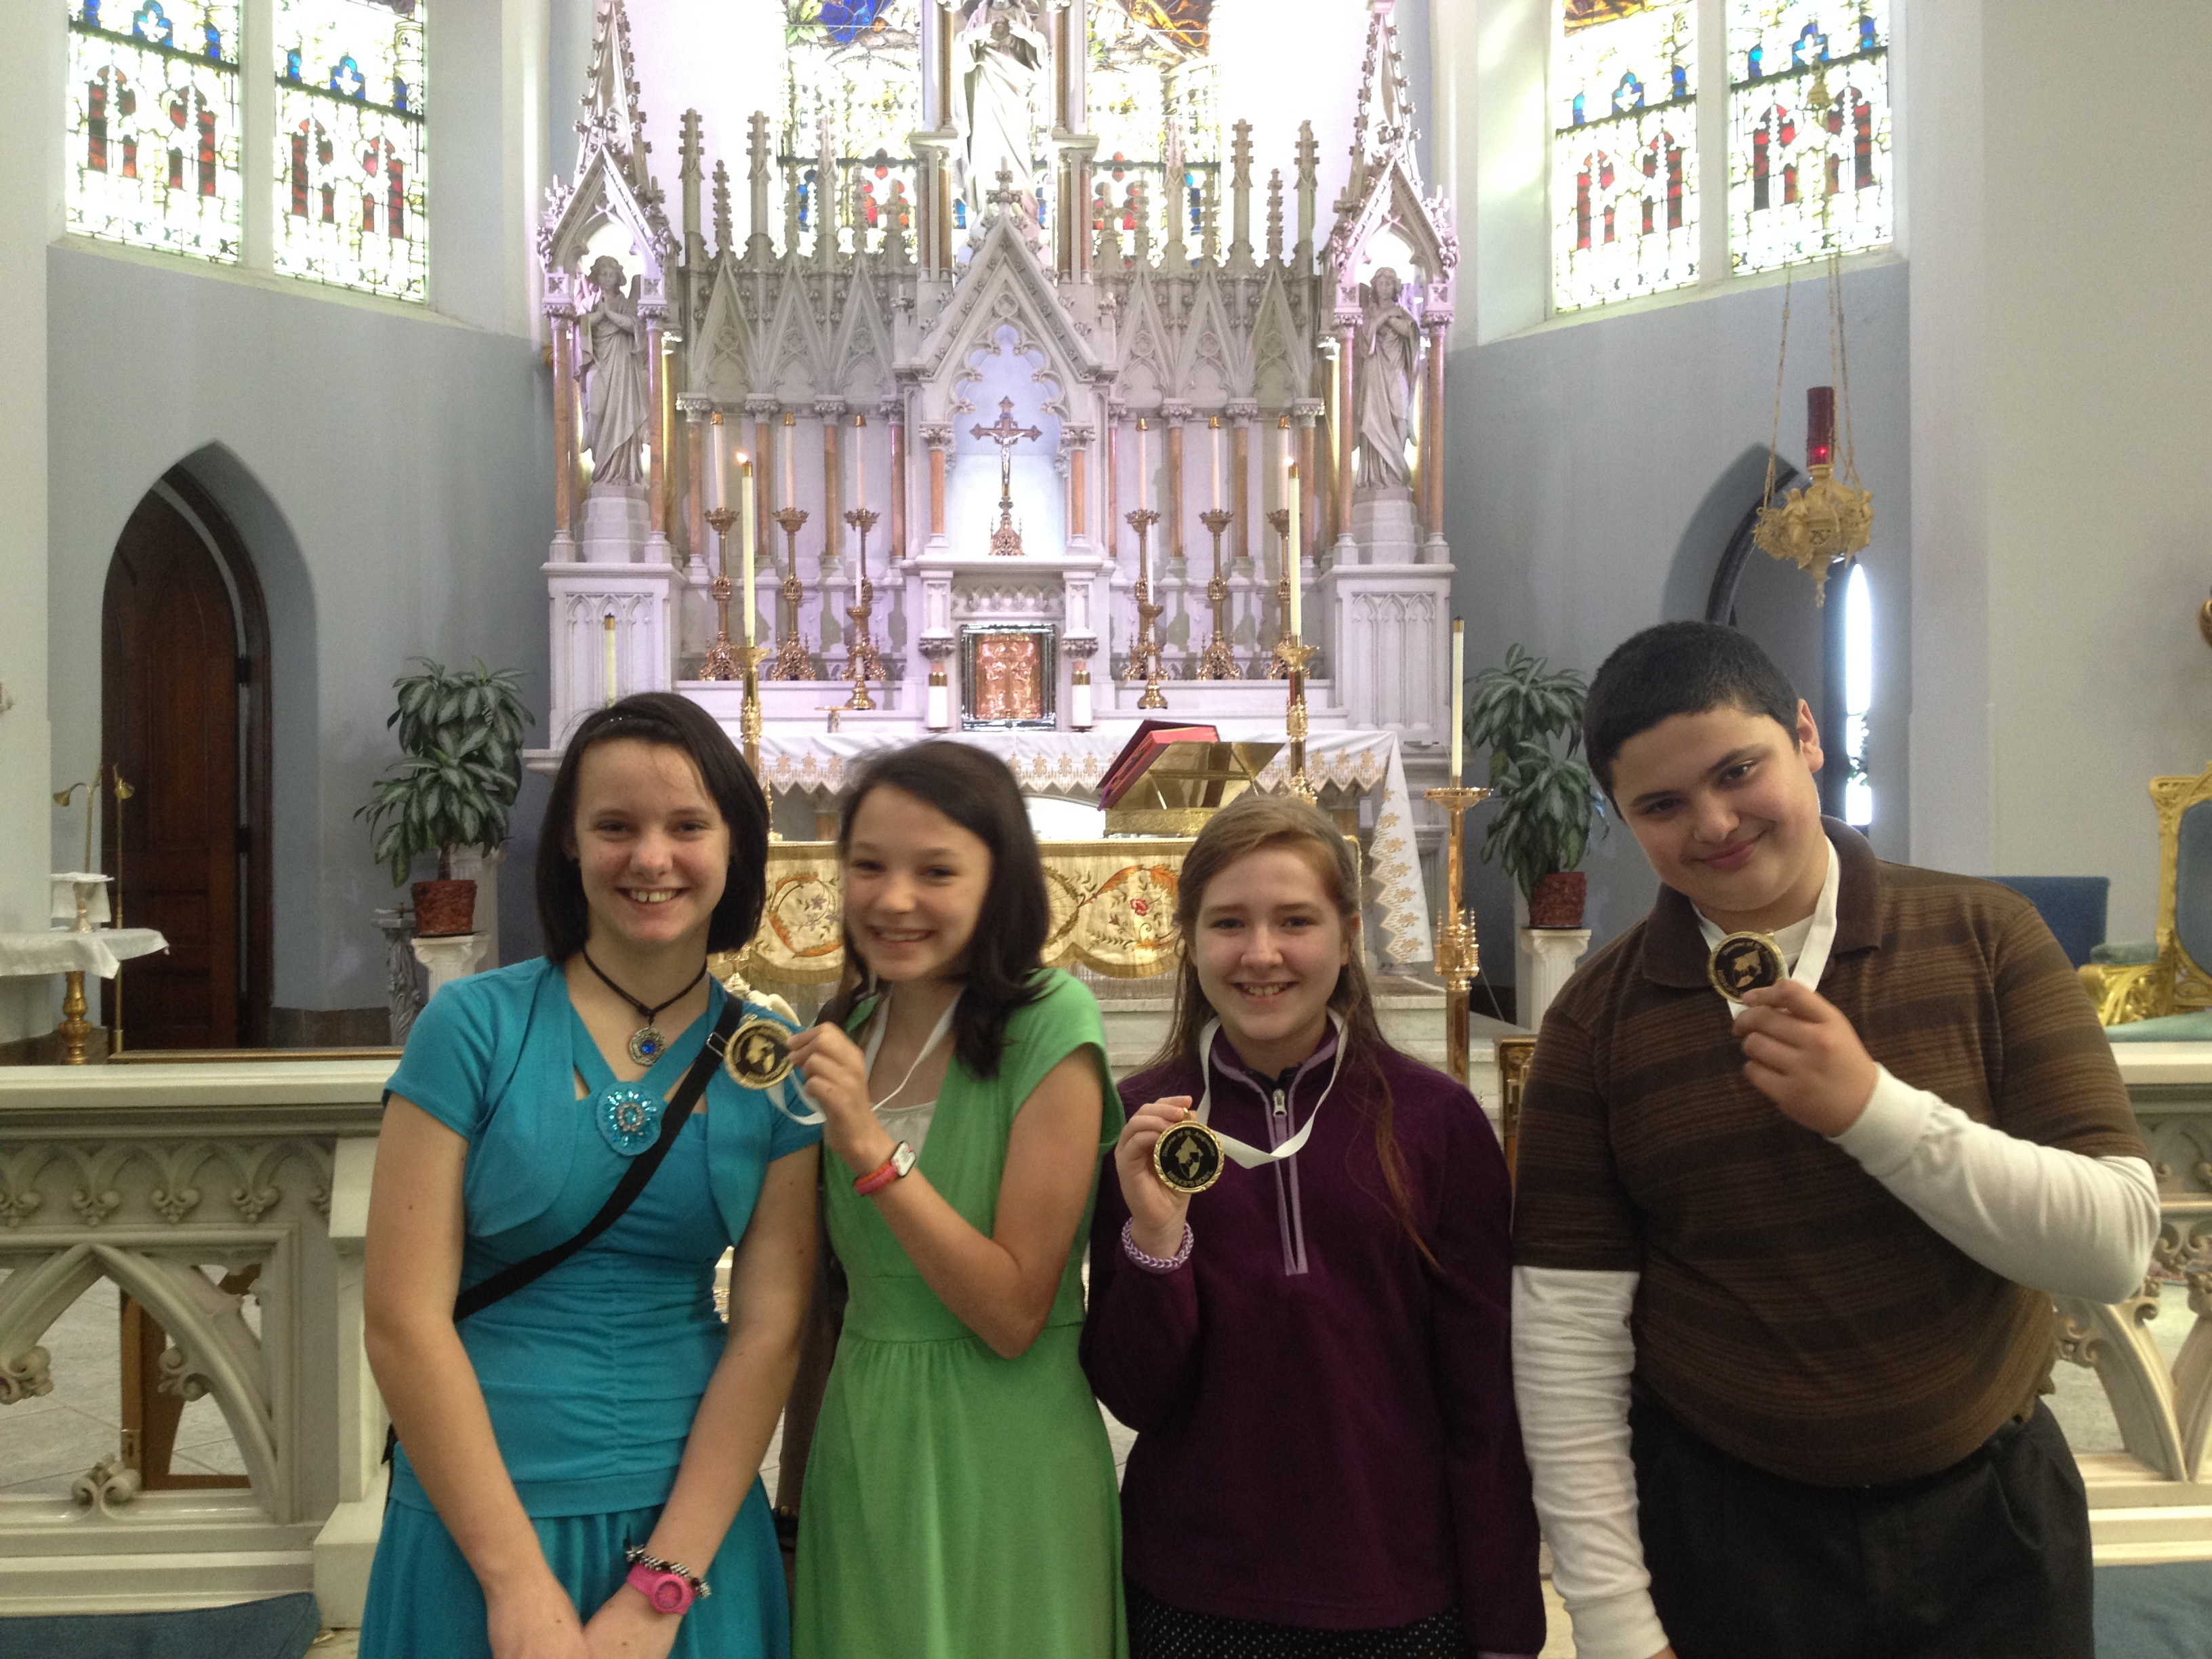 Sarah Wins Silver Medal in 'Bishops' Bowl' Olympics